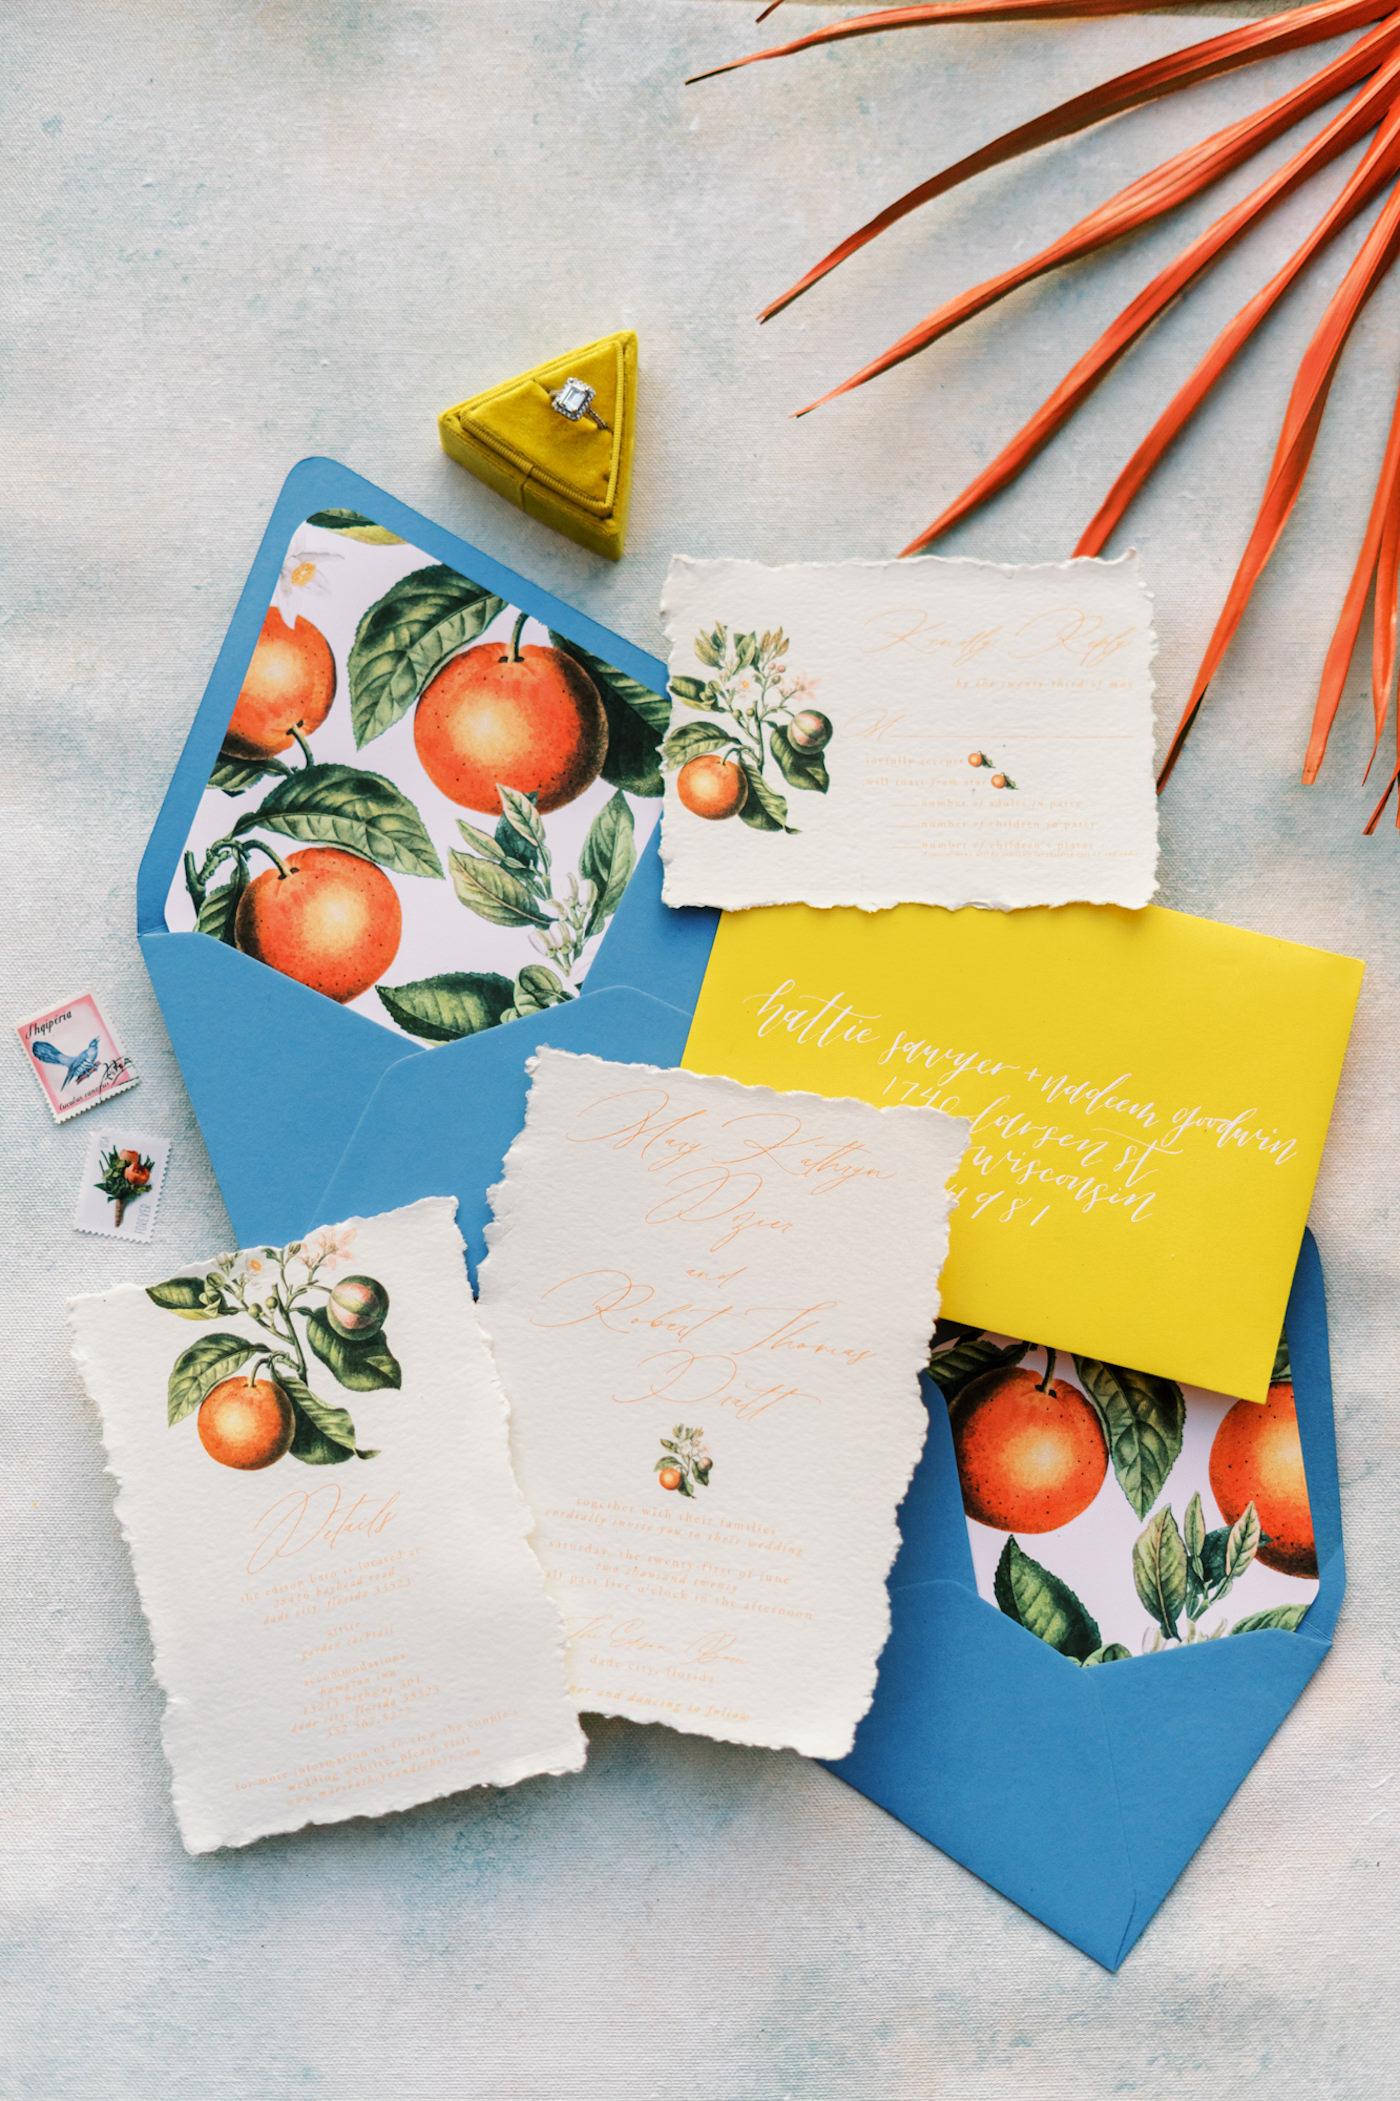 Florida Citrus Orange Stationery Suite Set with Envelope Liner | Wedding Invitation with Orange Blossom and Calligraphy